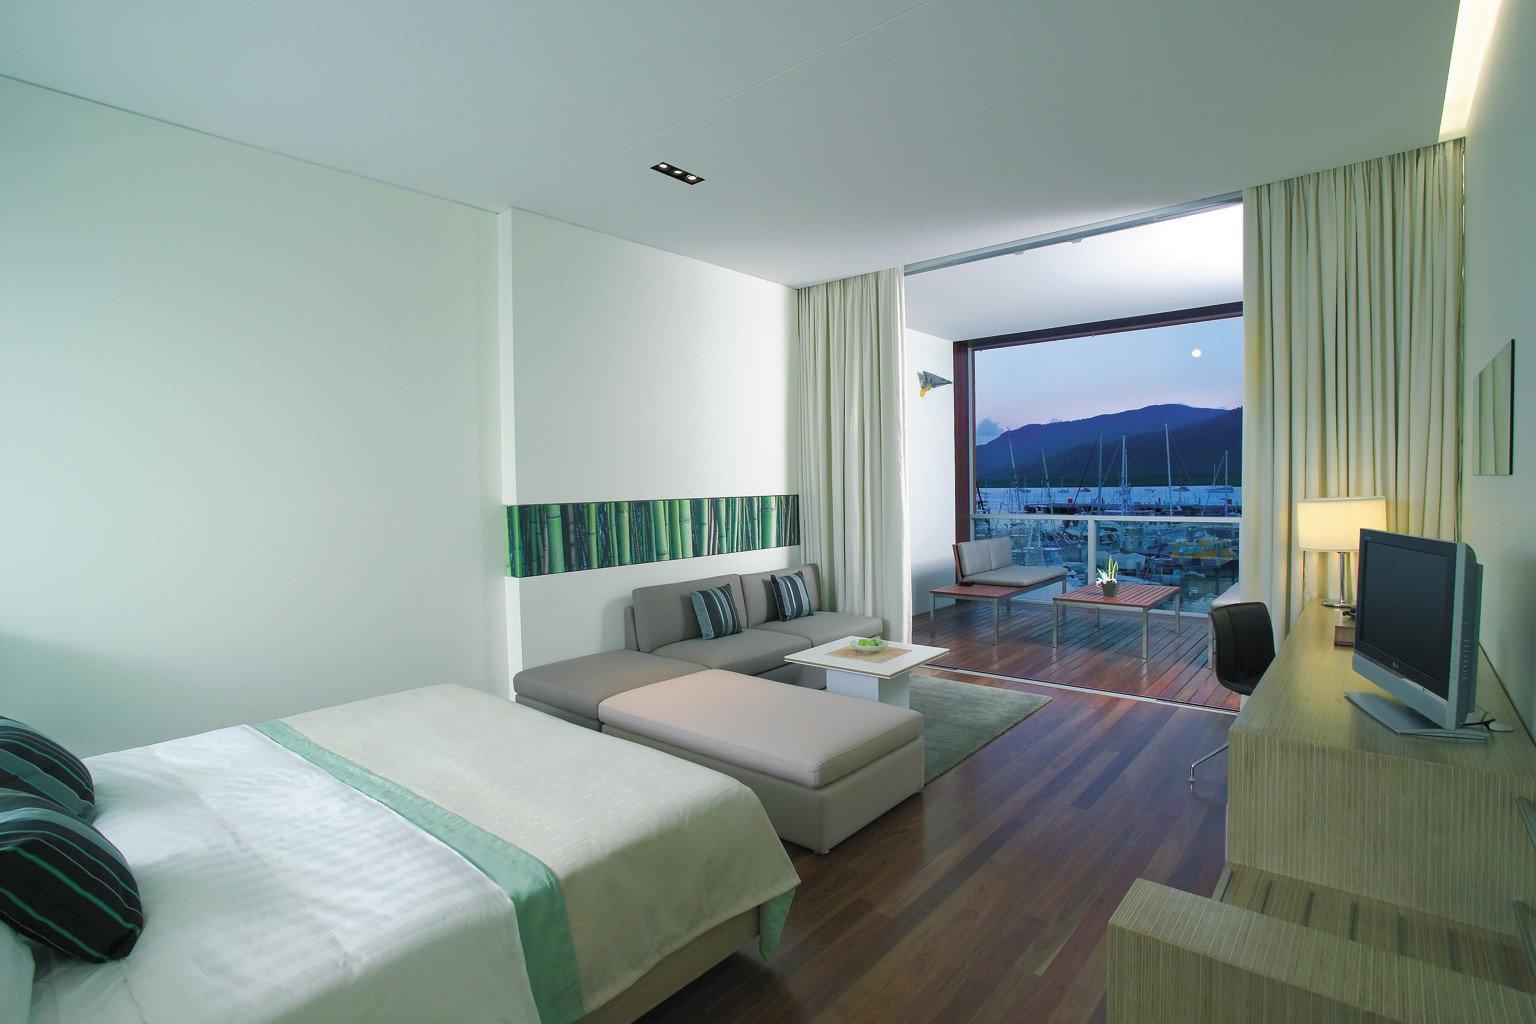 Bedroom Classic Luxury Waterfront green property condominium Suite living room Villa